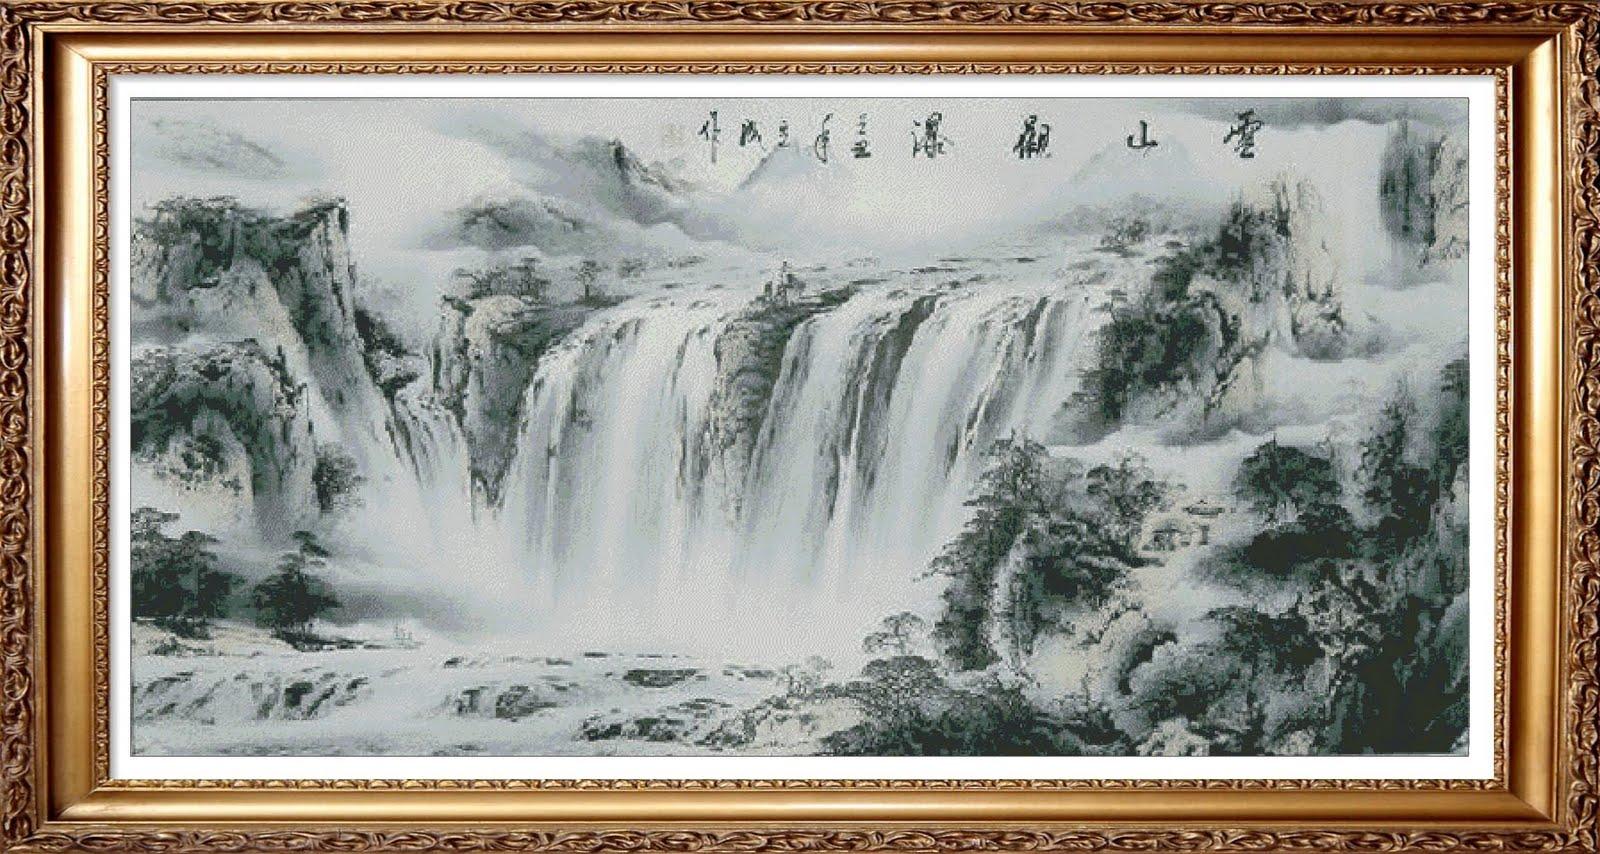 kristik [cross stitch] pemandangan air terjun , versi lukisan cina ...